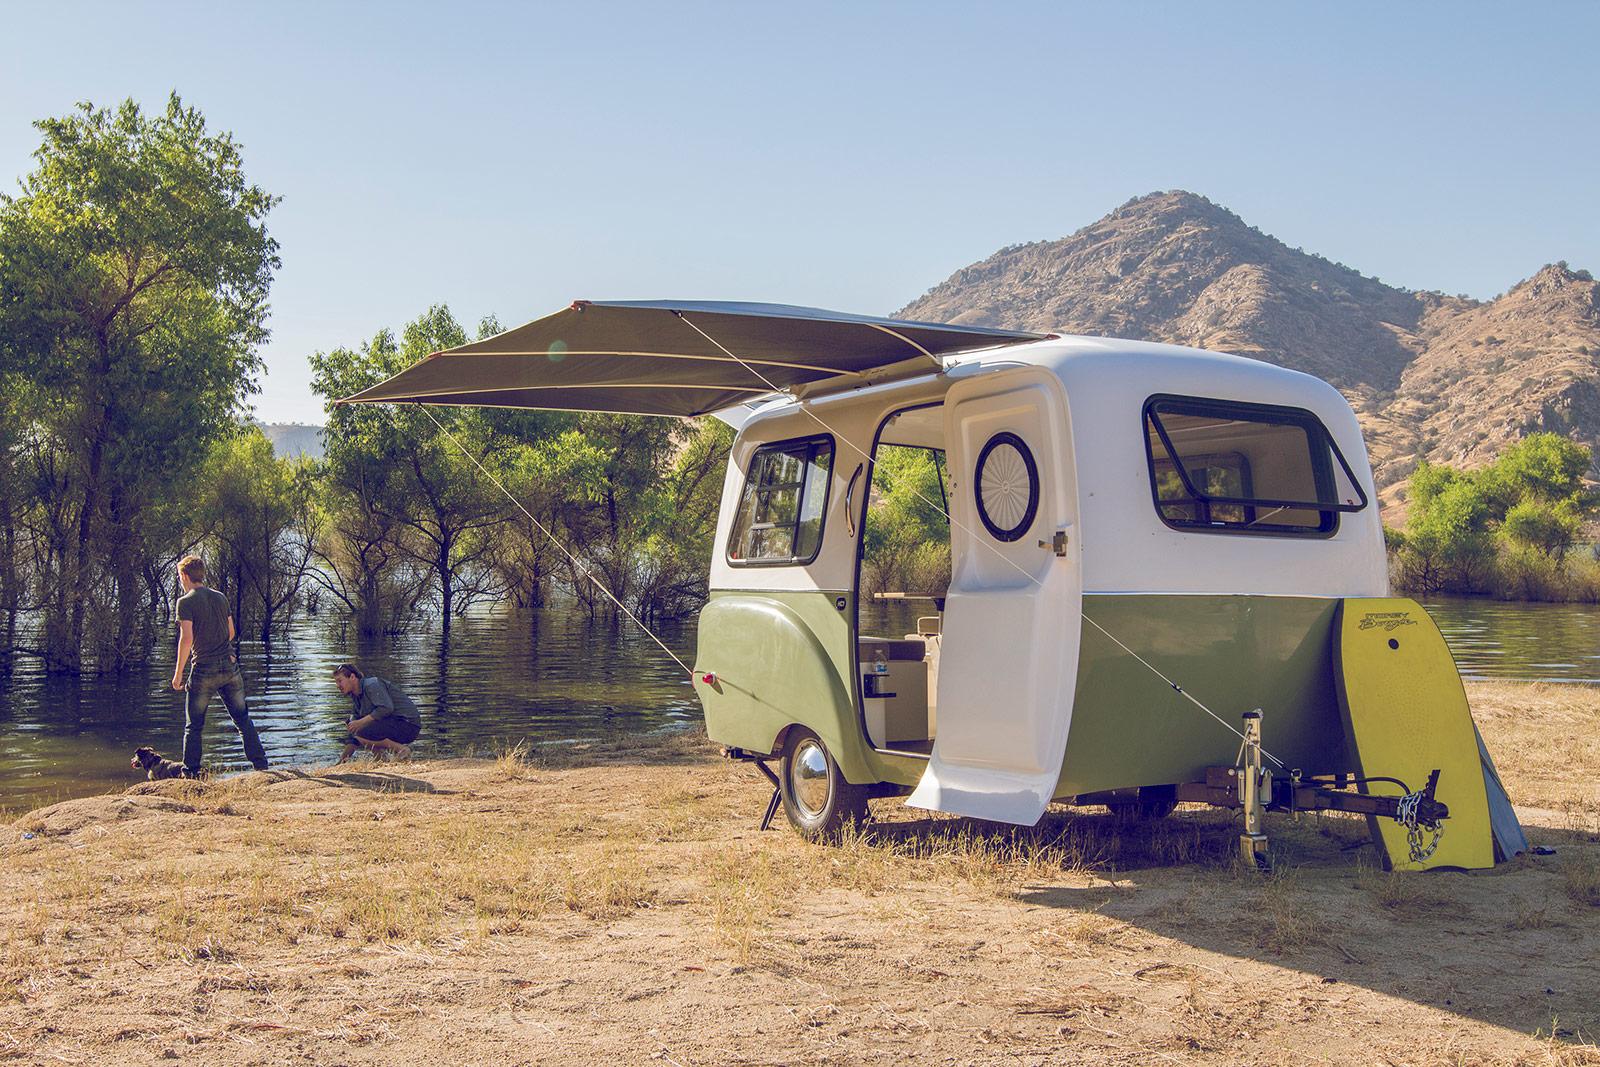 Image: Happier Camper Rentals